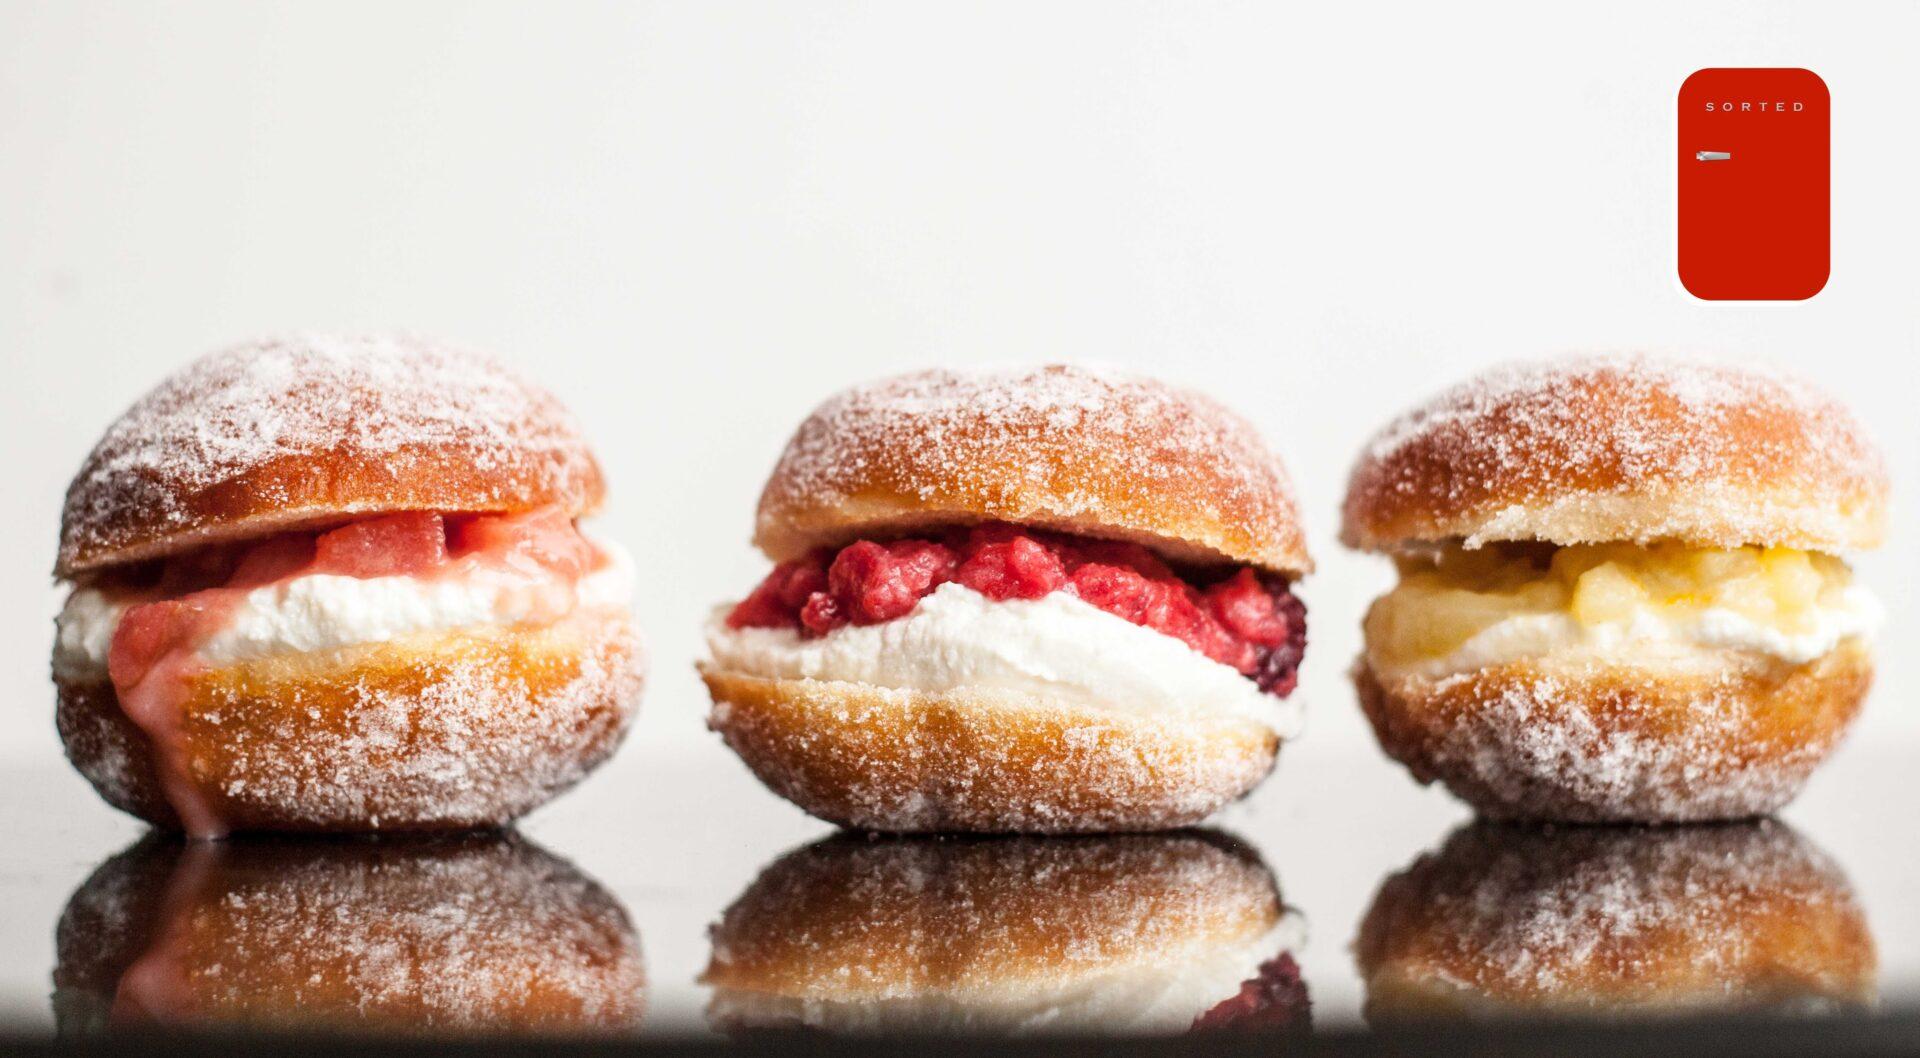 A Wonderful Doughnut Recipe For These 3 Fruity Doughnut Sliders